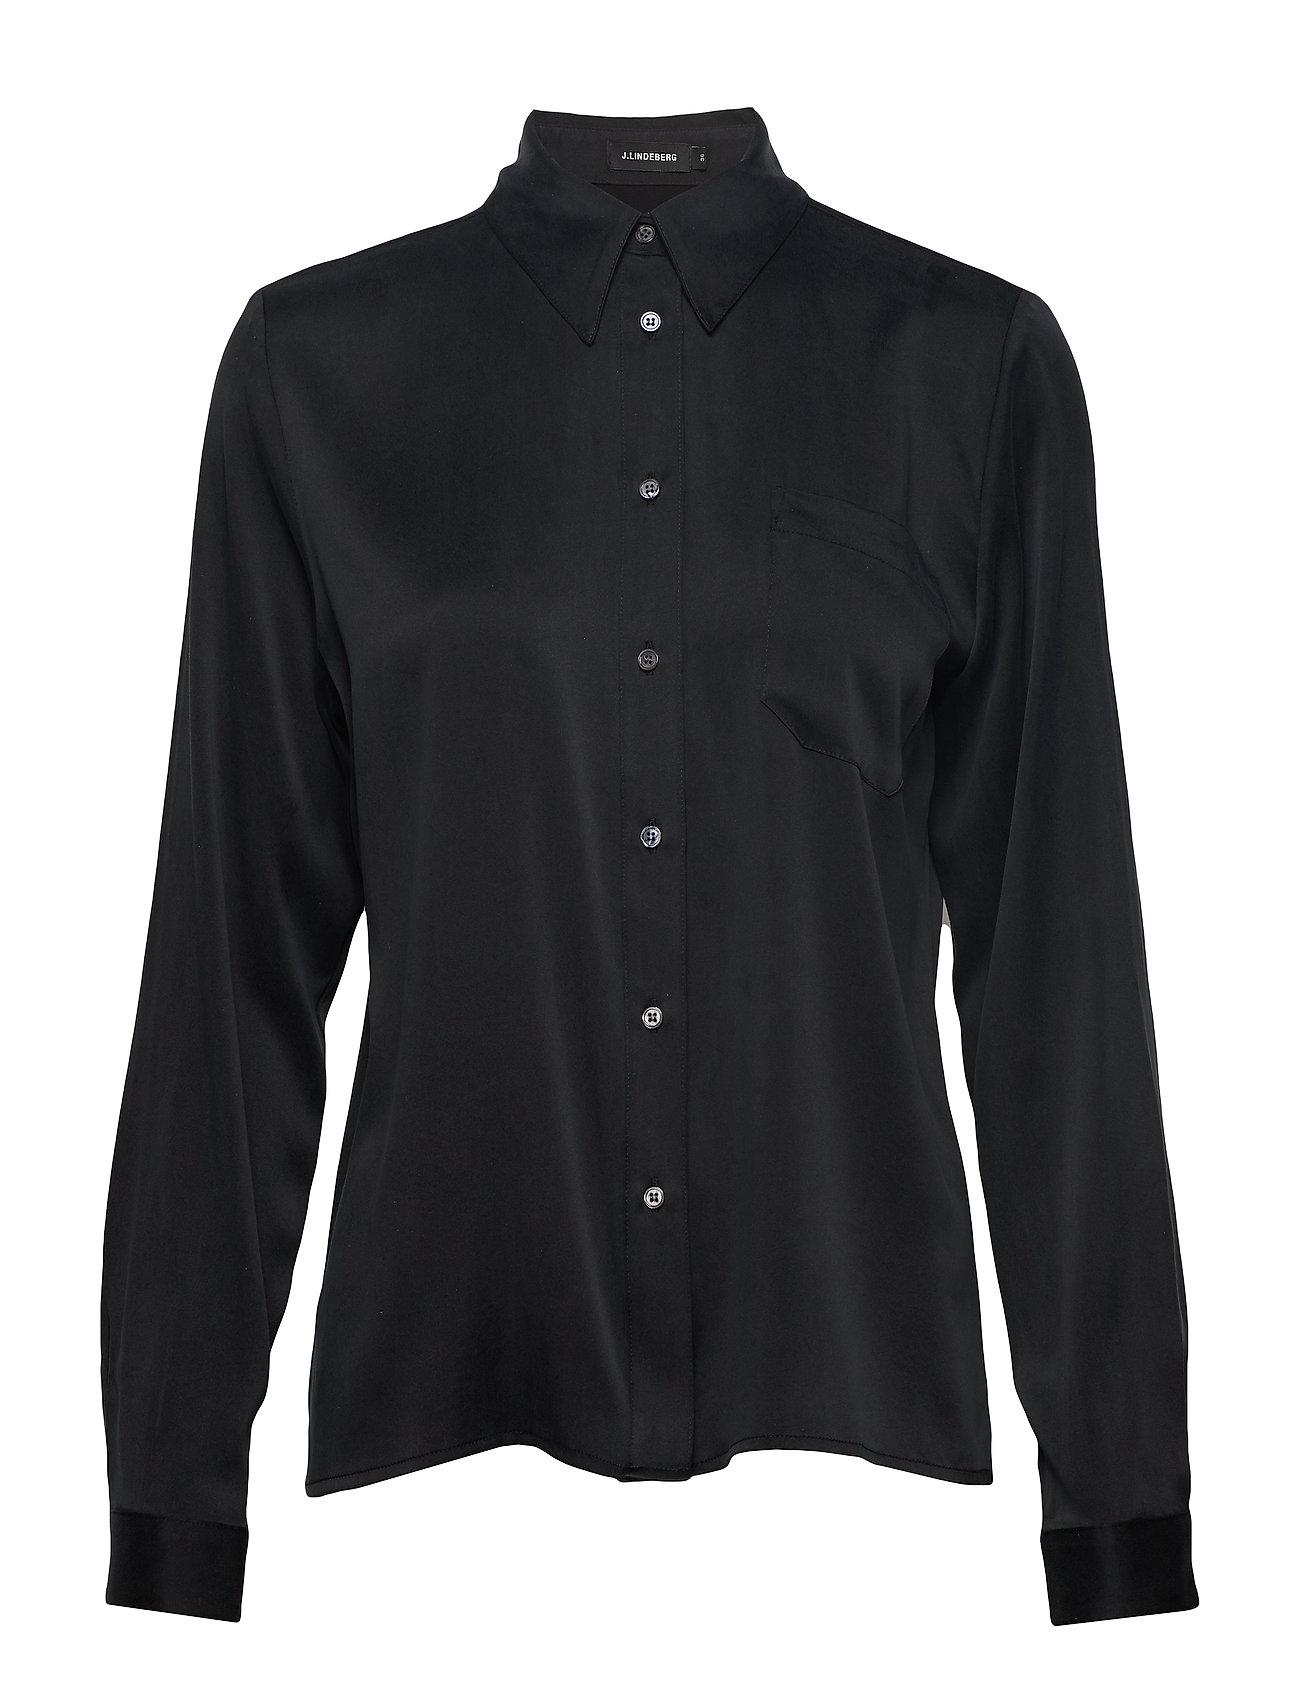 J. Lindeberg Mallory-Washed Silk - BLACK